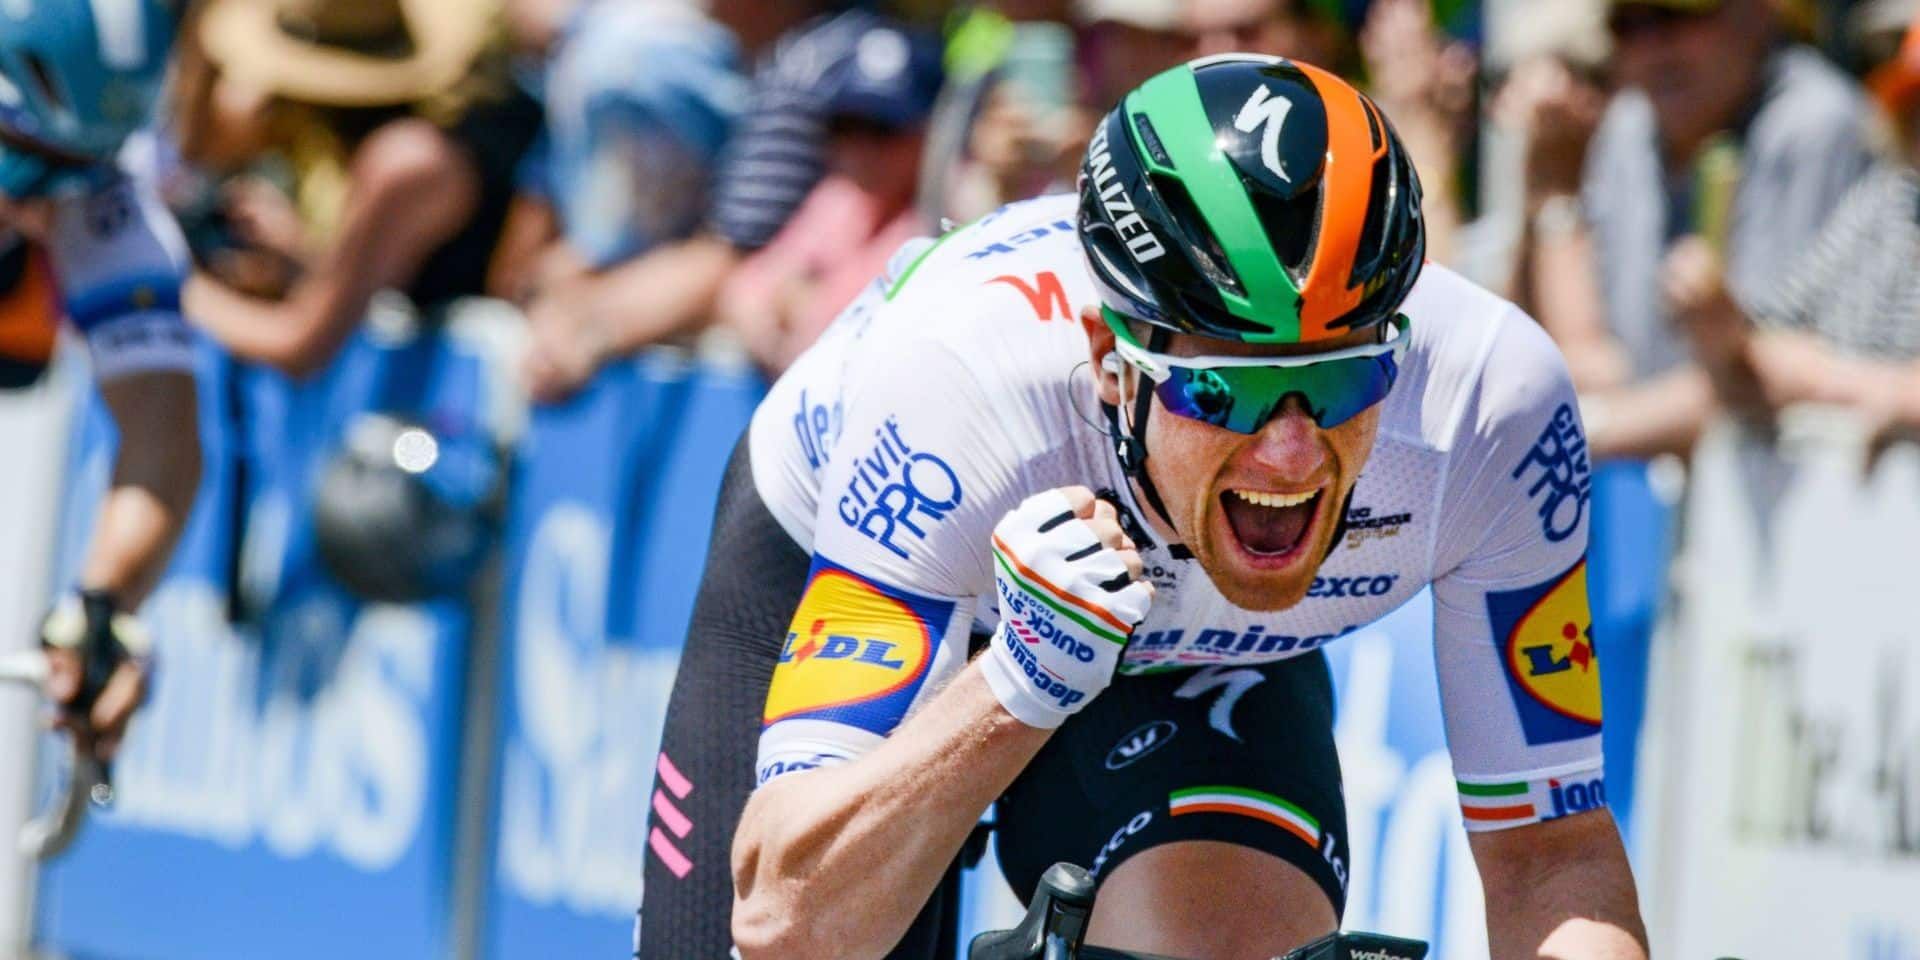 Tour de Burgos: Sam Bennett s'offre la 4e étape, Remco Evenepoel toujours leader